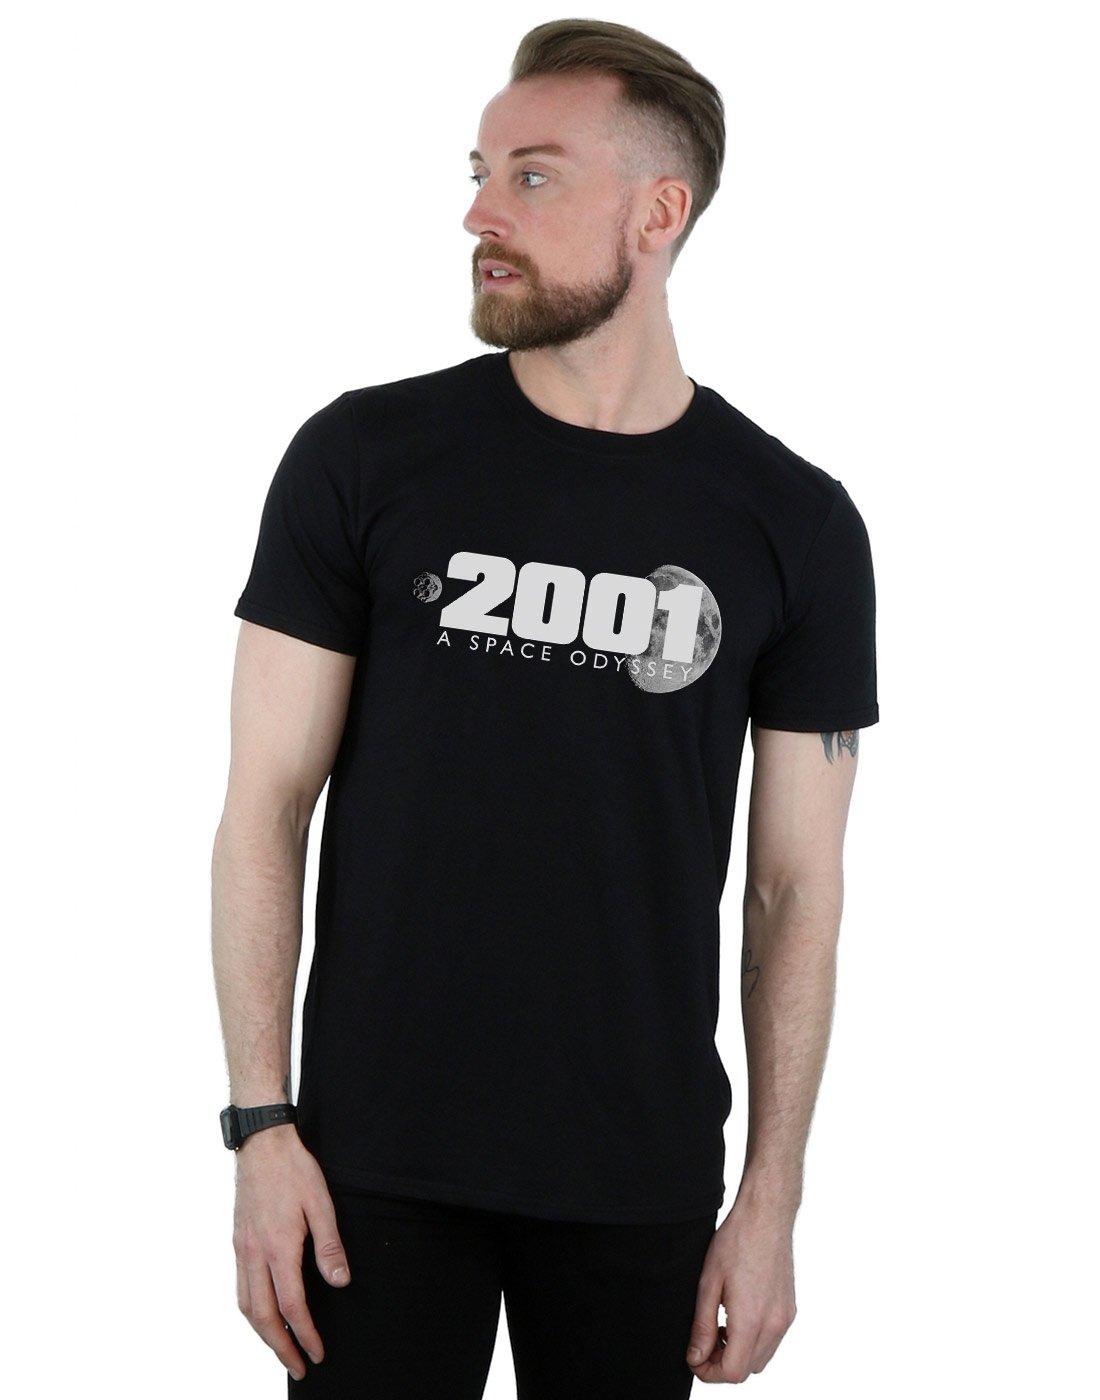 2001 A Space Odyssey Moon Logo T Shirt 2055